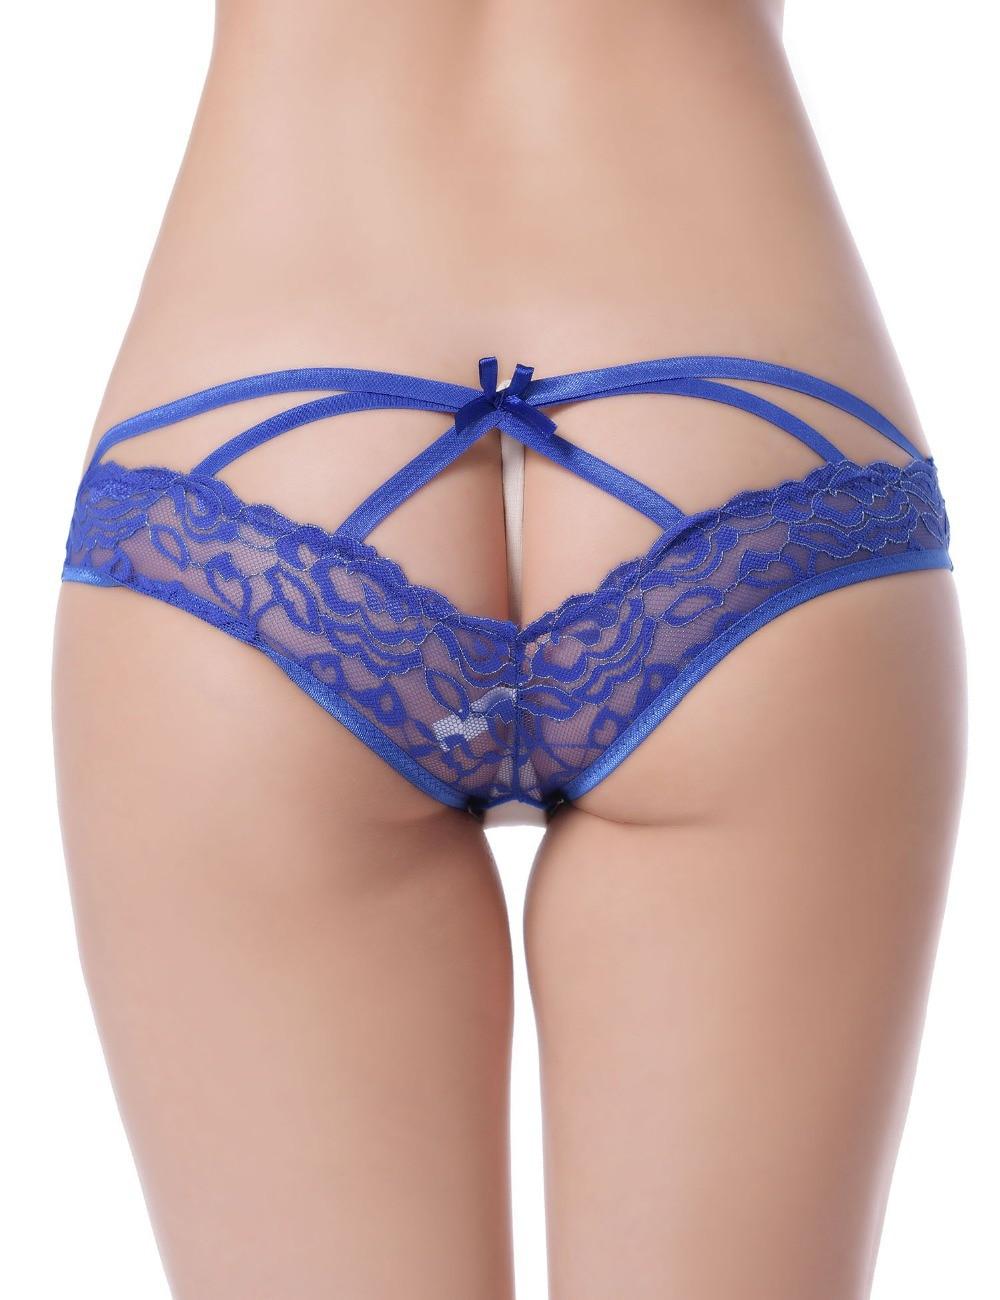 Aliexpress.com : Buy PH5012 Ohyeah brand new hot sale underwear ...